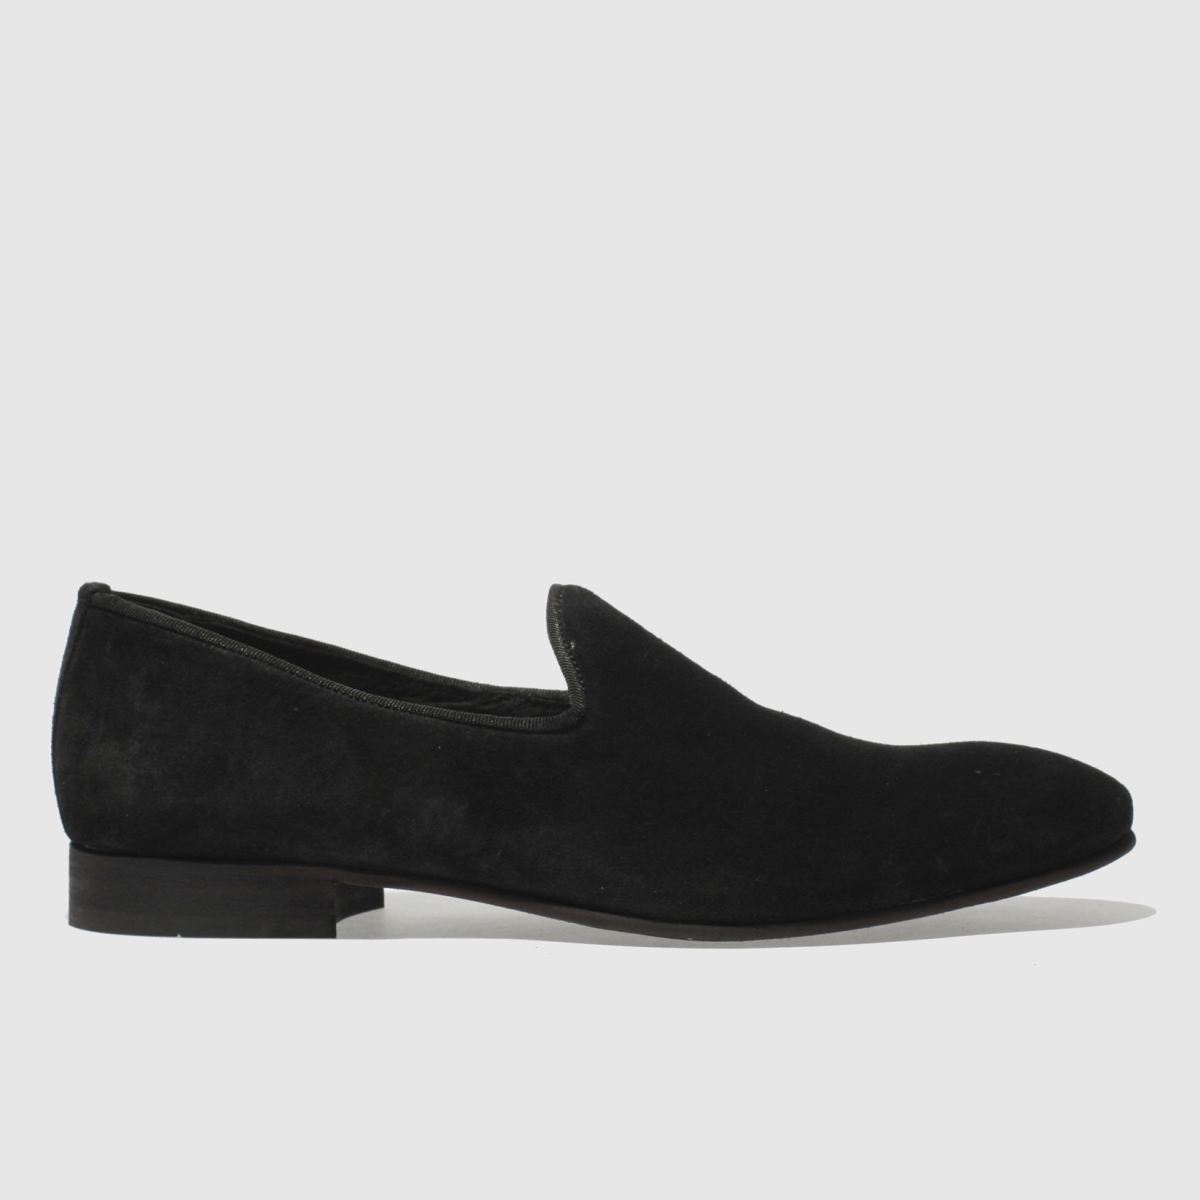 Schuh Black Wicks Slip Shoes